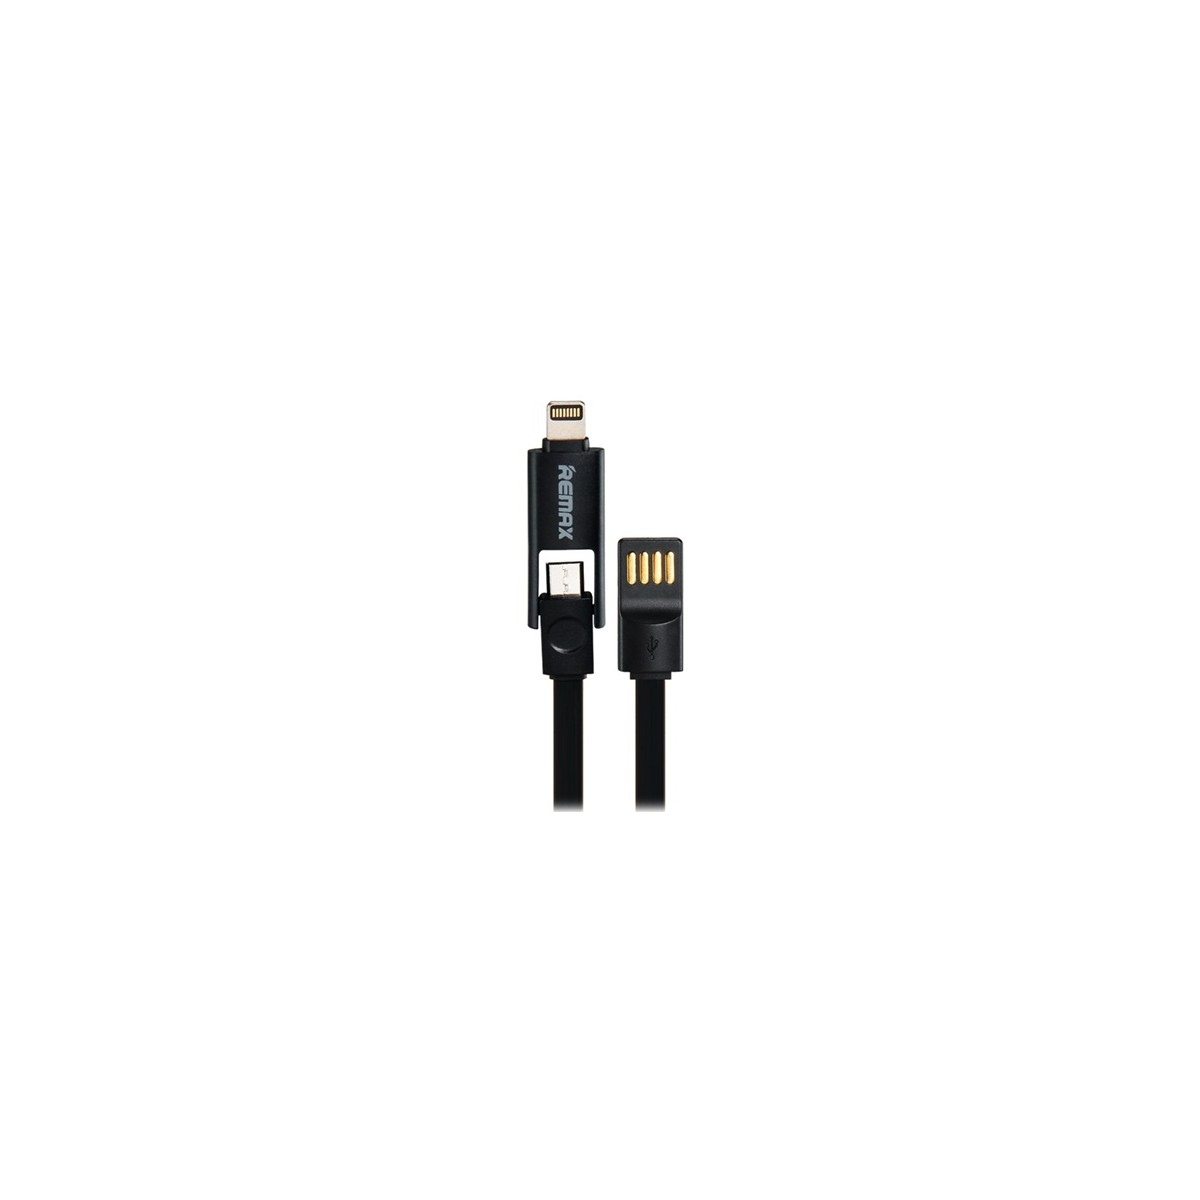 Datový kabel Remax pro iPhone 5/6+microUSB 1,2m černý